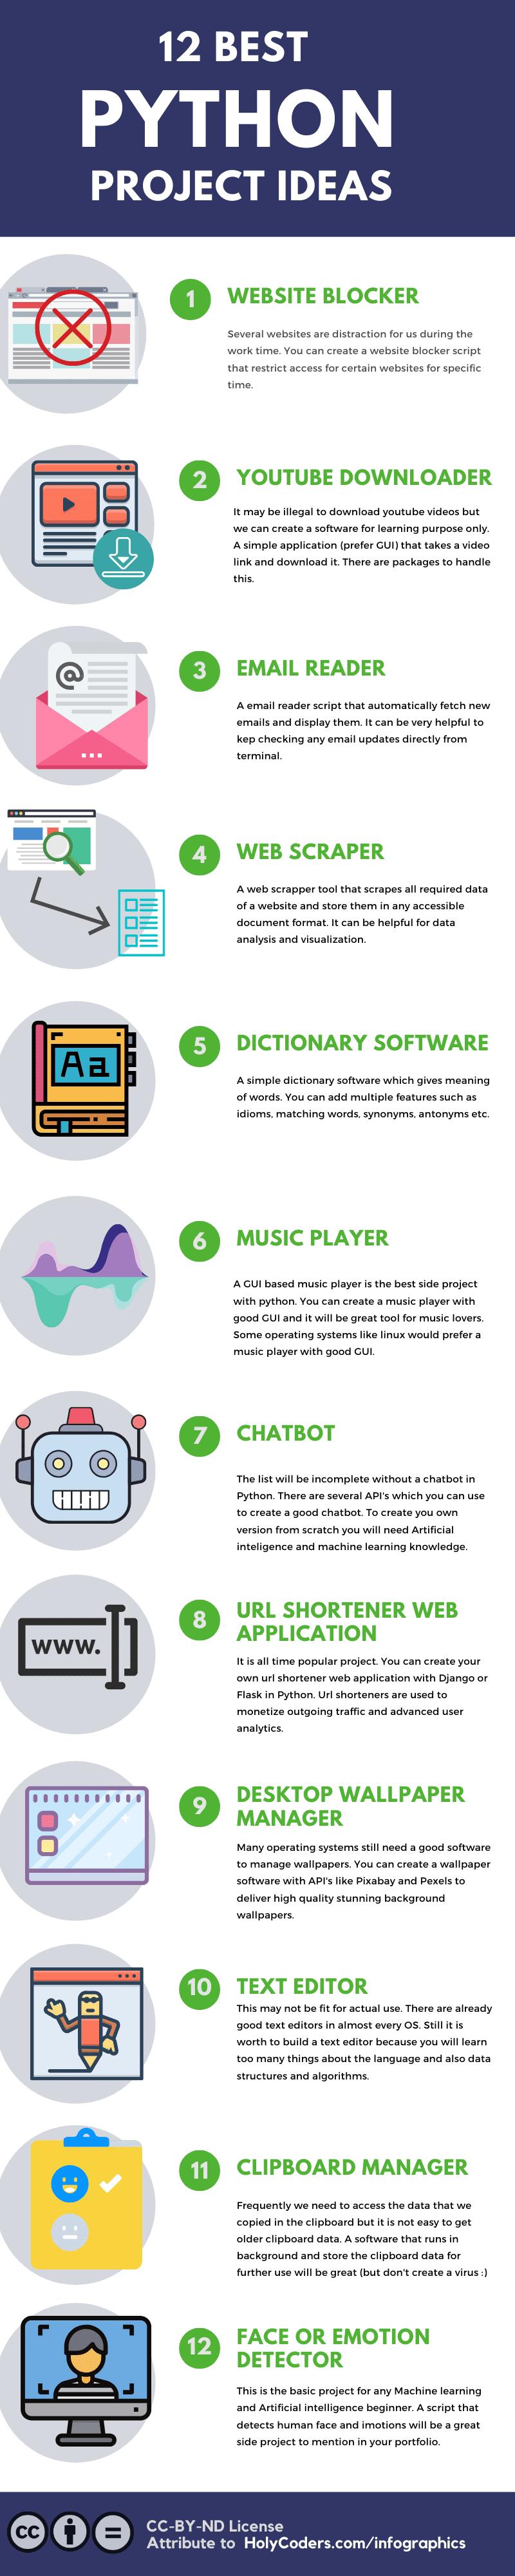 Best Python project ideas